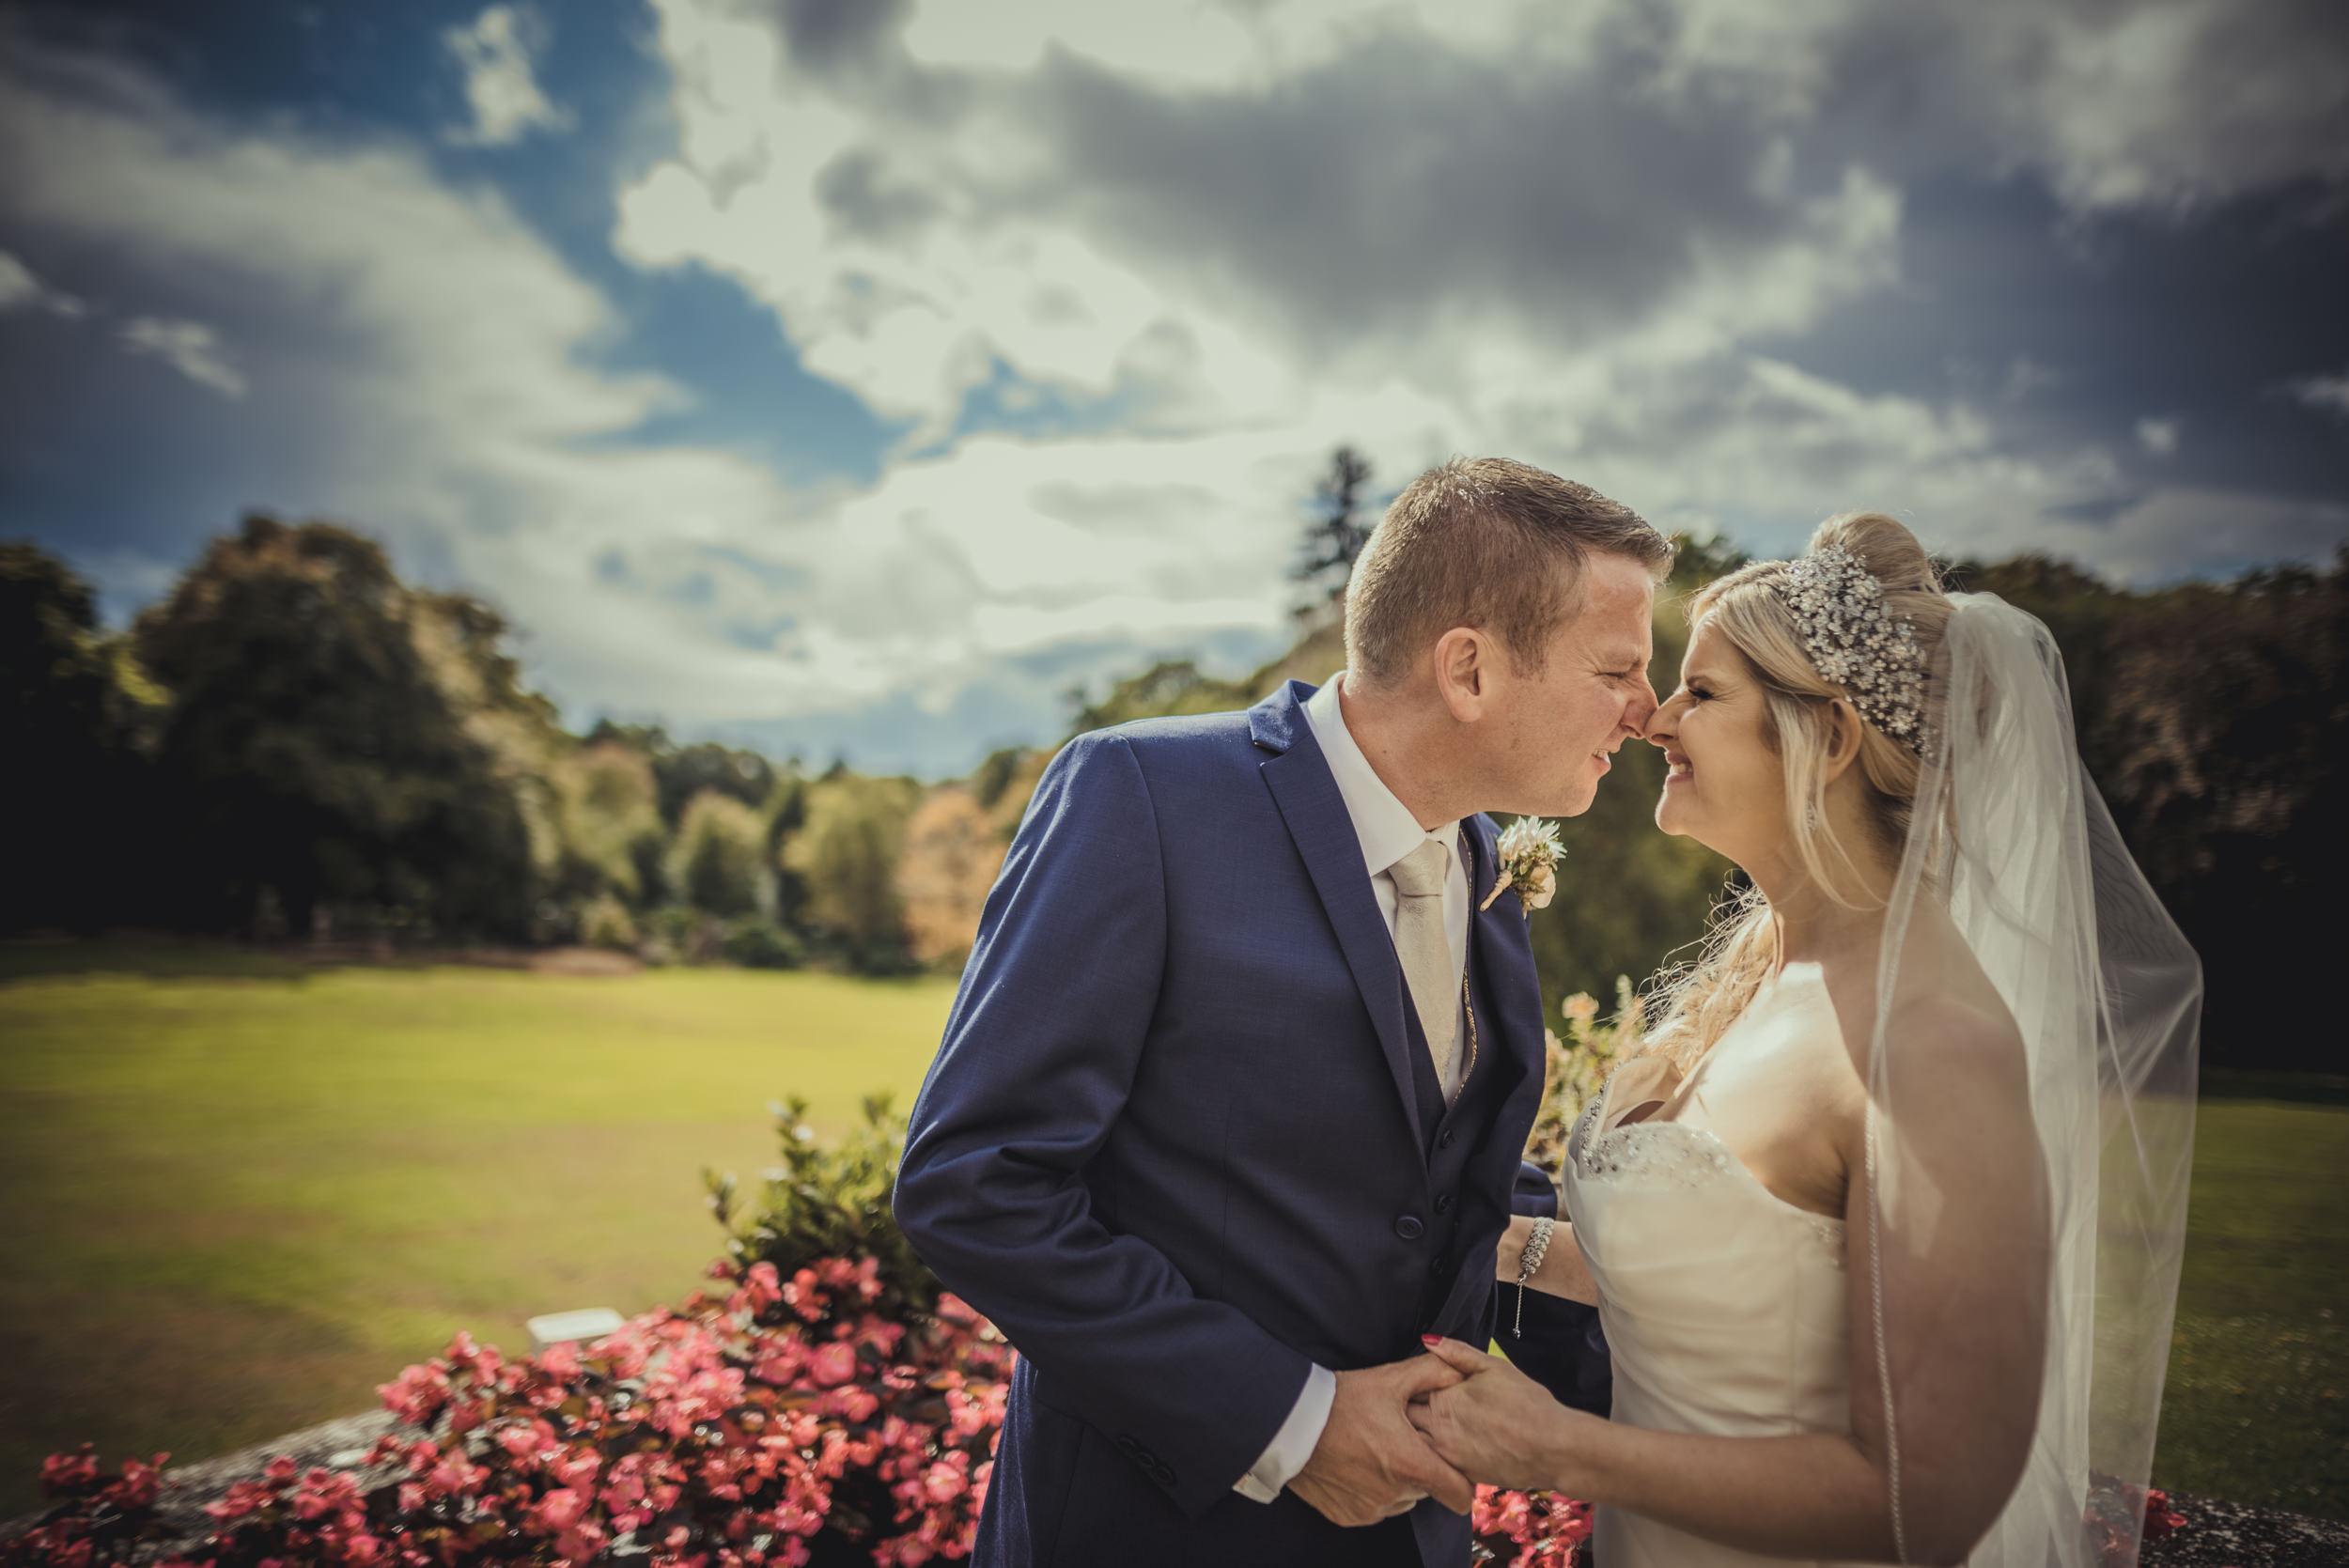 Trisha-and-Roger-wedding-The-Priory-Church-and-Chewton-Glen-Hotel-Christchurch-Manu-Mendoza-Wedding-Photography-304.jpg